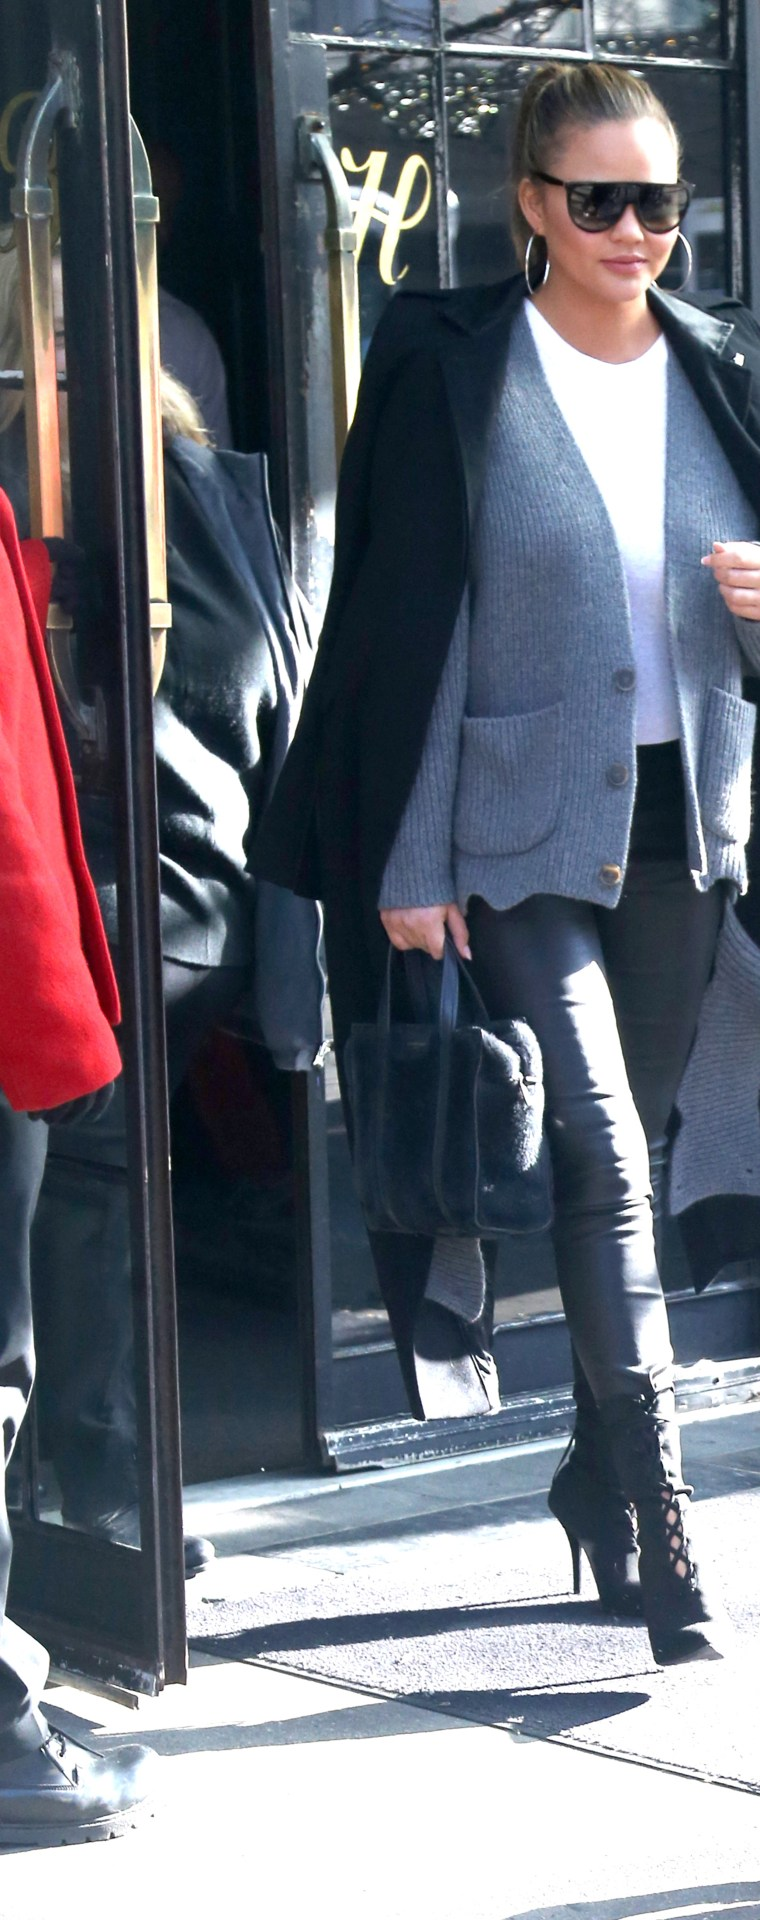 Chrissy Teigen & John Legend Sighting, NYC